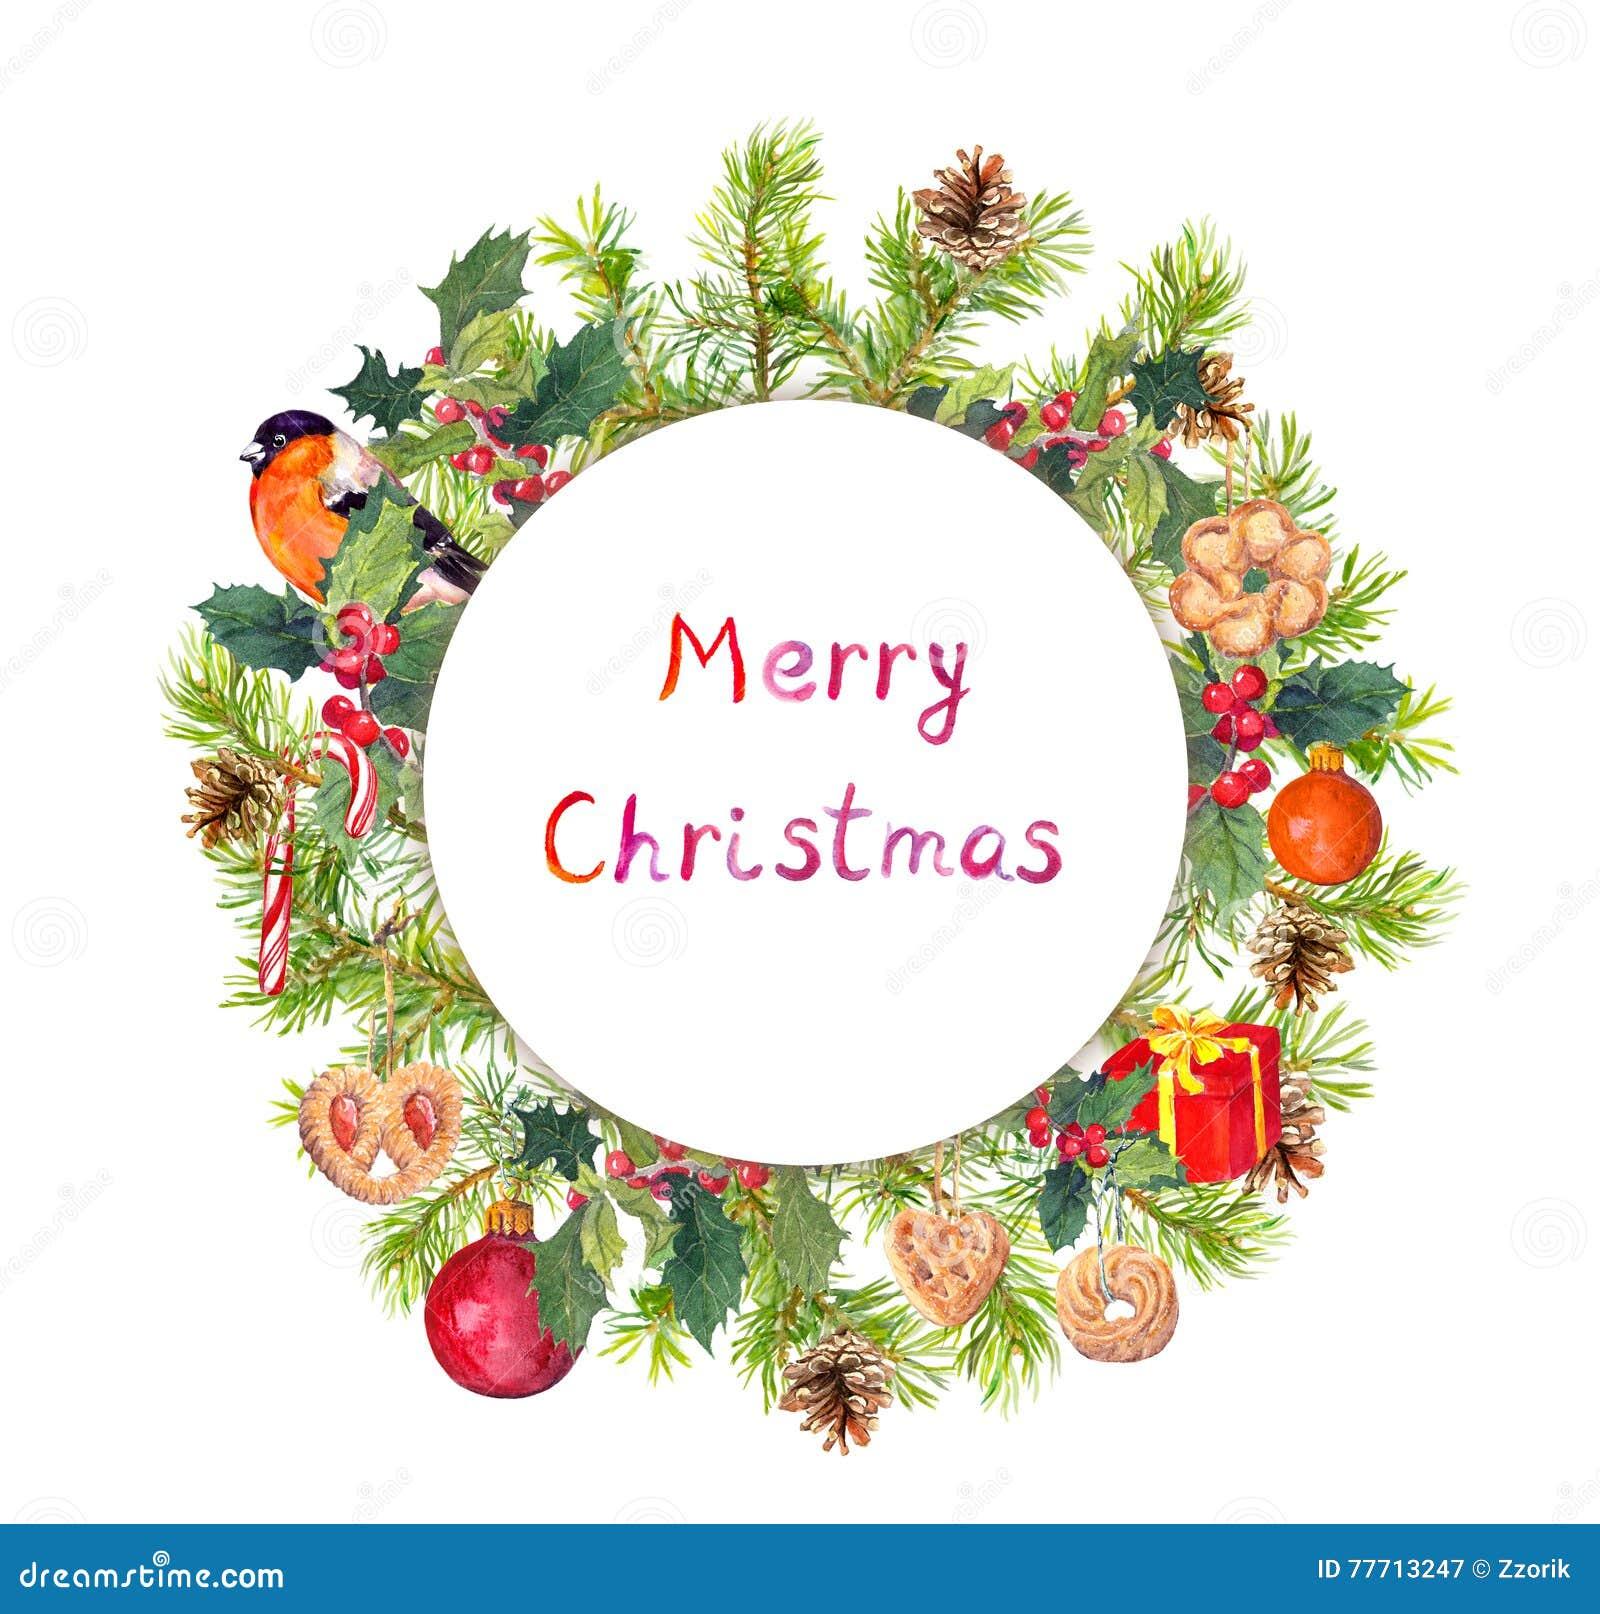 Christmas Wreath Fir Branches Bird Candycane Present Box